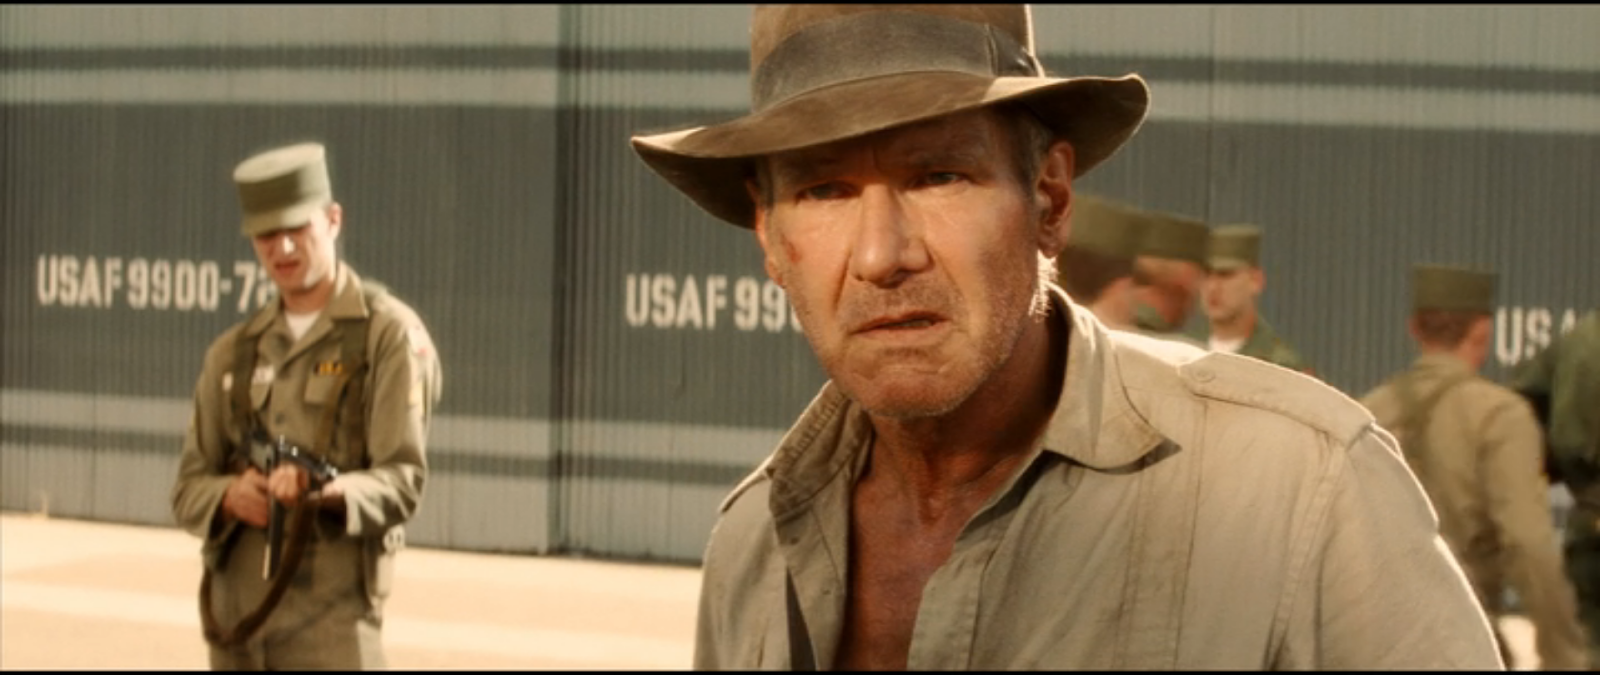 Aom Movies Et Al Indiana Jones And The Kingdom Of The Crystal Skull 2008